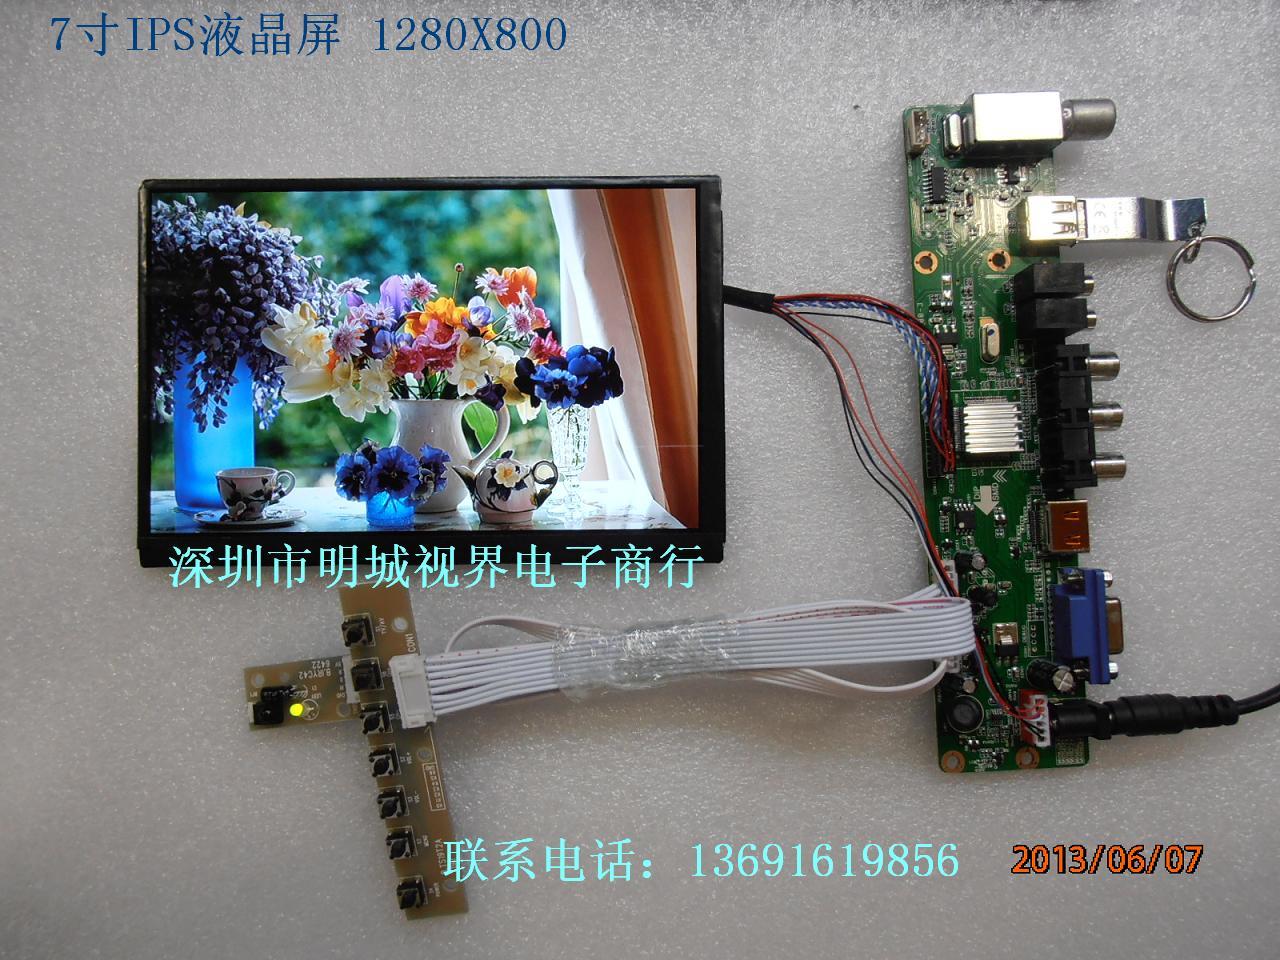 Diy projection tv nesting 1280x800 n070icg ld1 n070icg ld4 ...